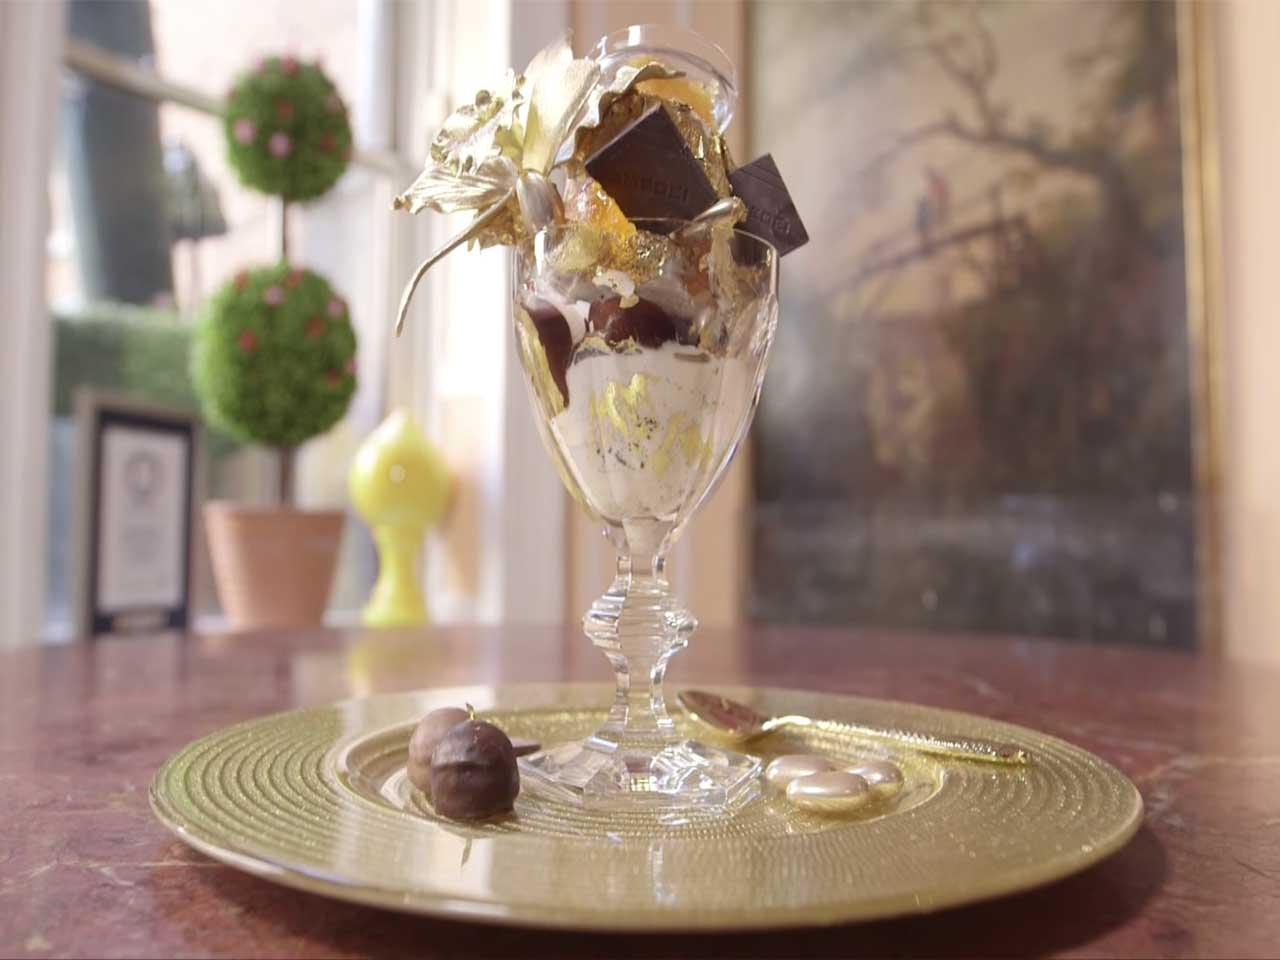 The Frrrozen Haute Chocolate ice cream sundae - $25,000 (£12,000), expensive, food, foods, people, life